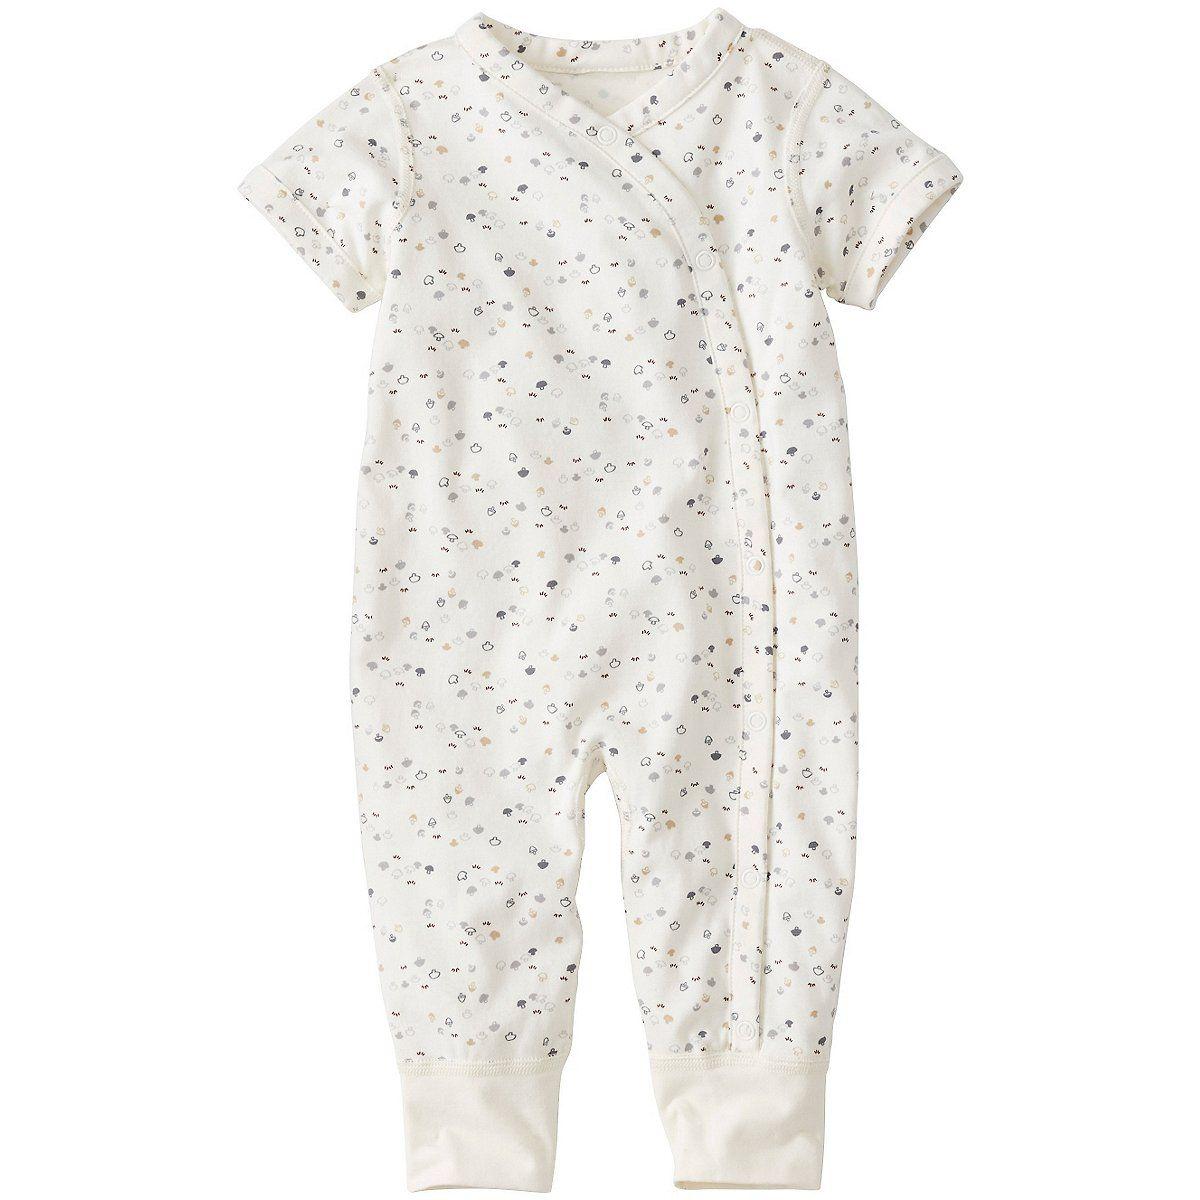 f8b74454a15 Snuggle Romper In Organic Pima Cotton by Hanna Andersson